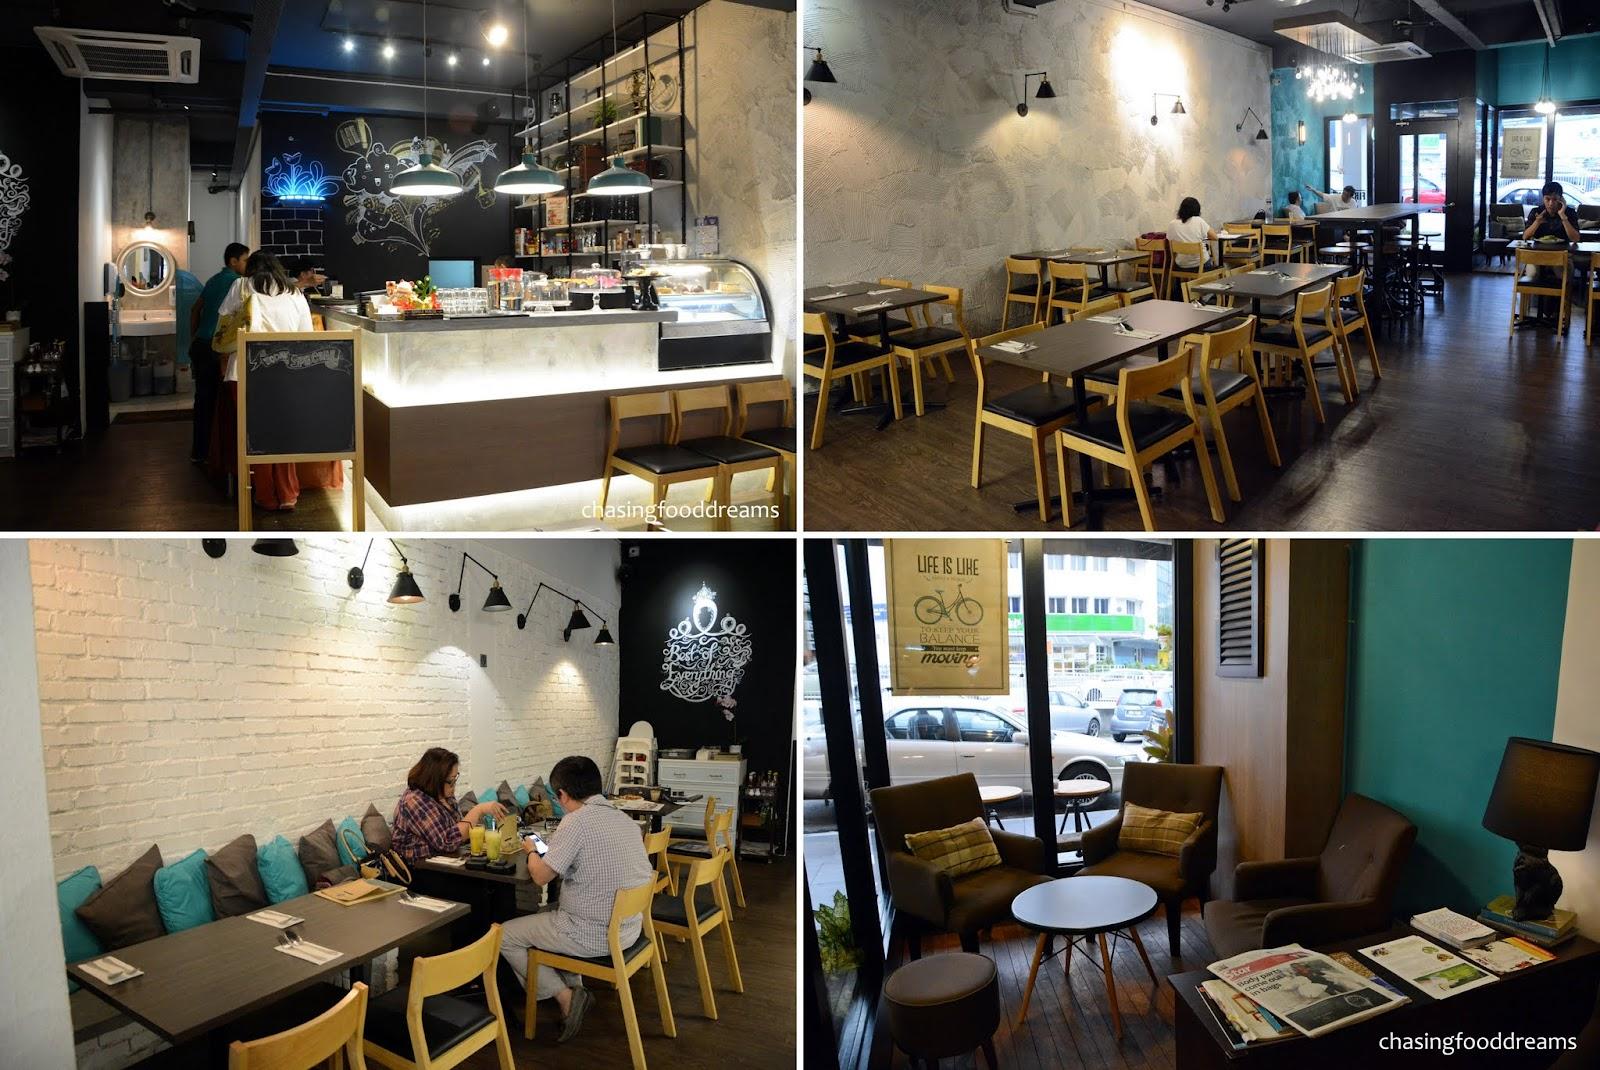 Chasing food dreams: bofe eatery @ section 19, petaling jaya